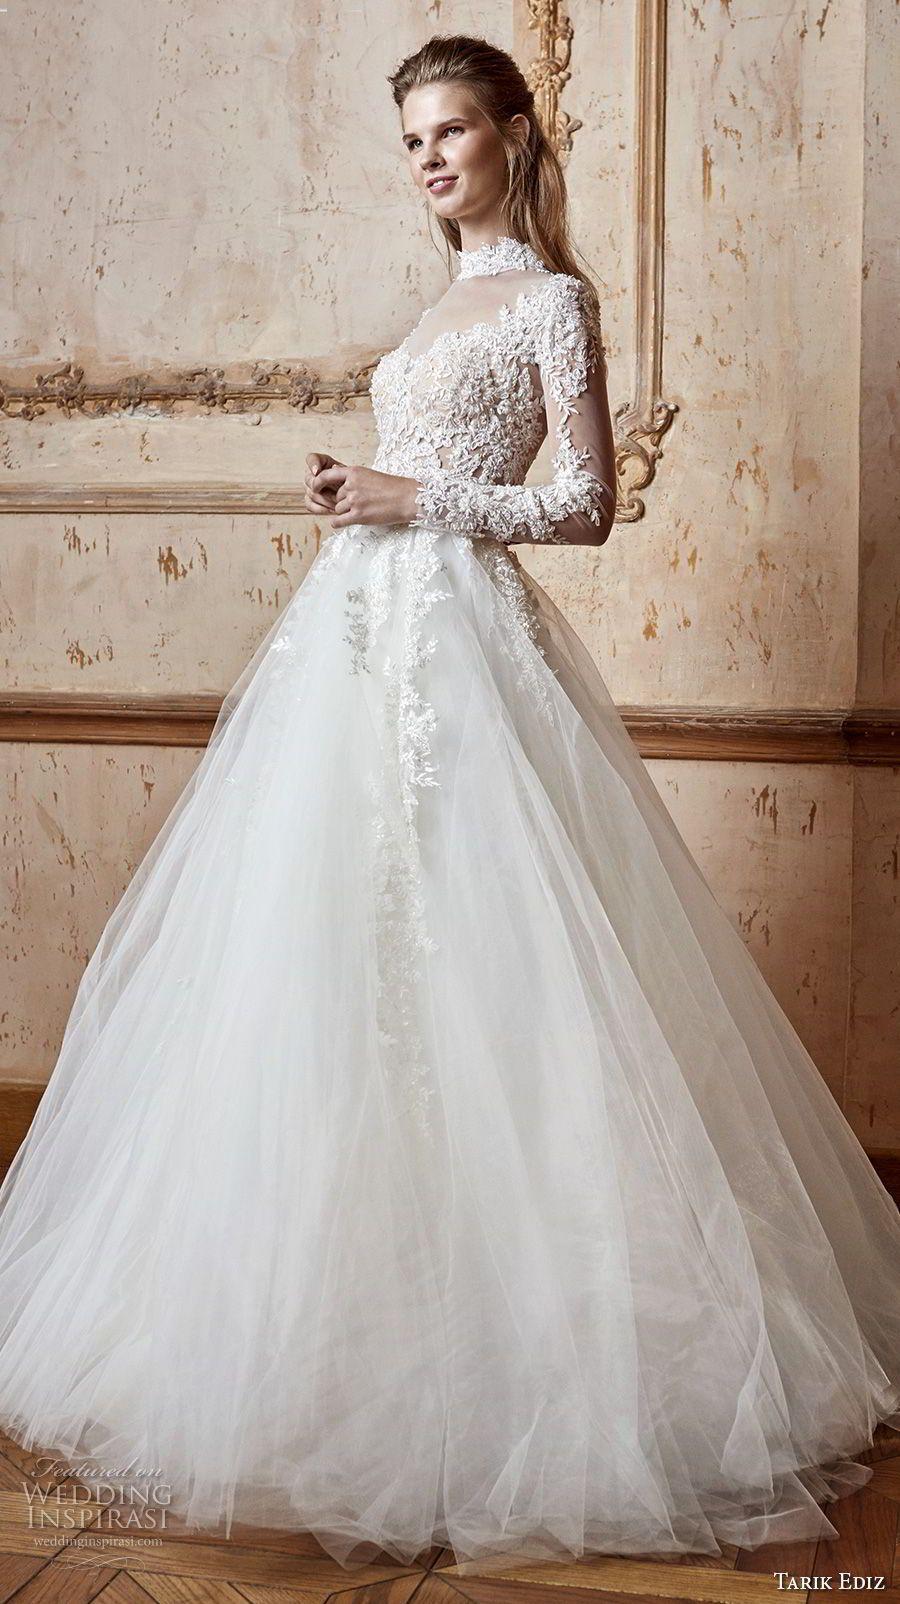 Tarik ediz white wedding dresses b pinterest wedding